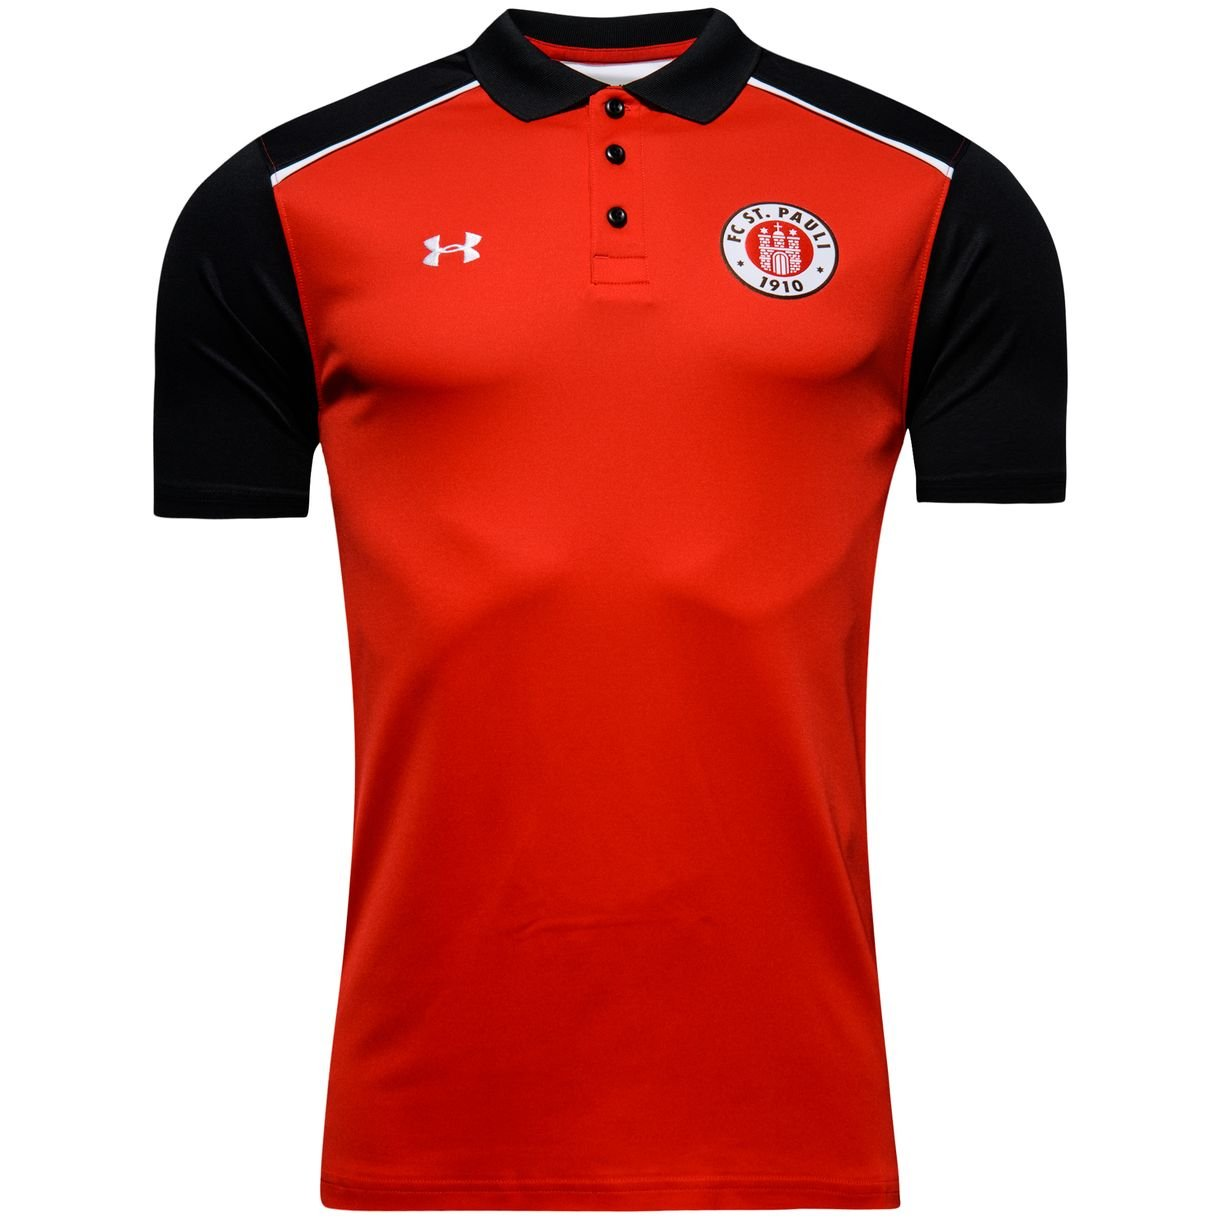 2016-2017 St Pauli Team Polo Shirt (Red): Amazon.es: Deportes y ...